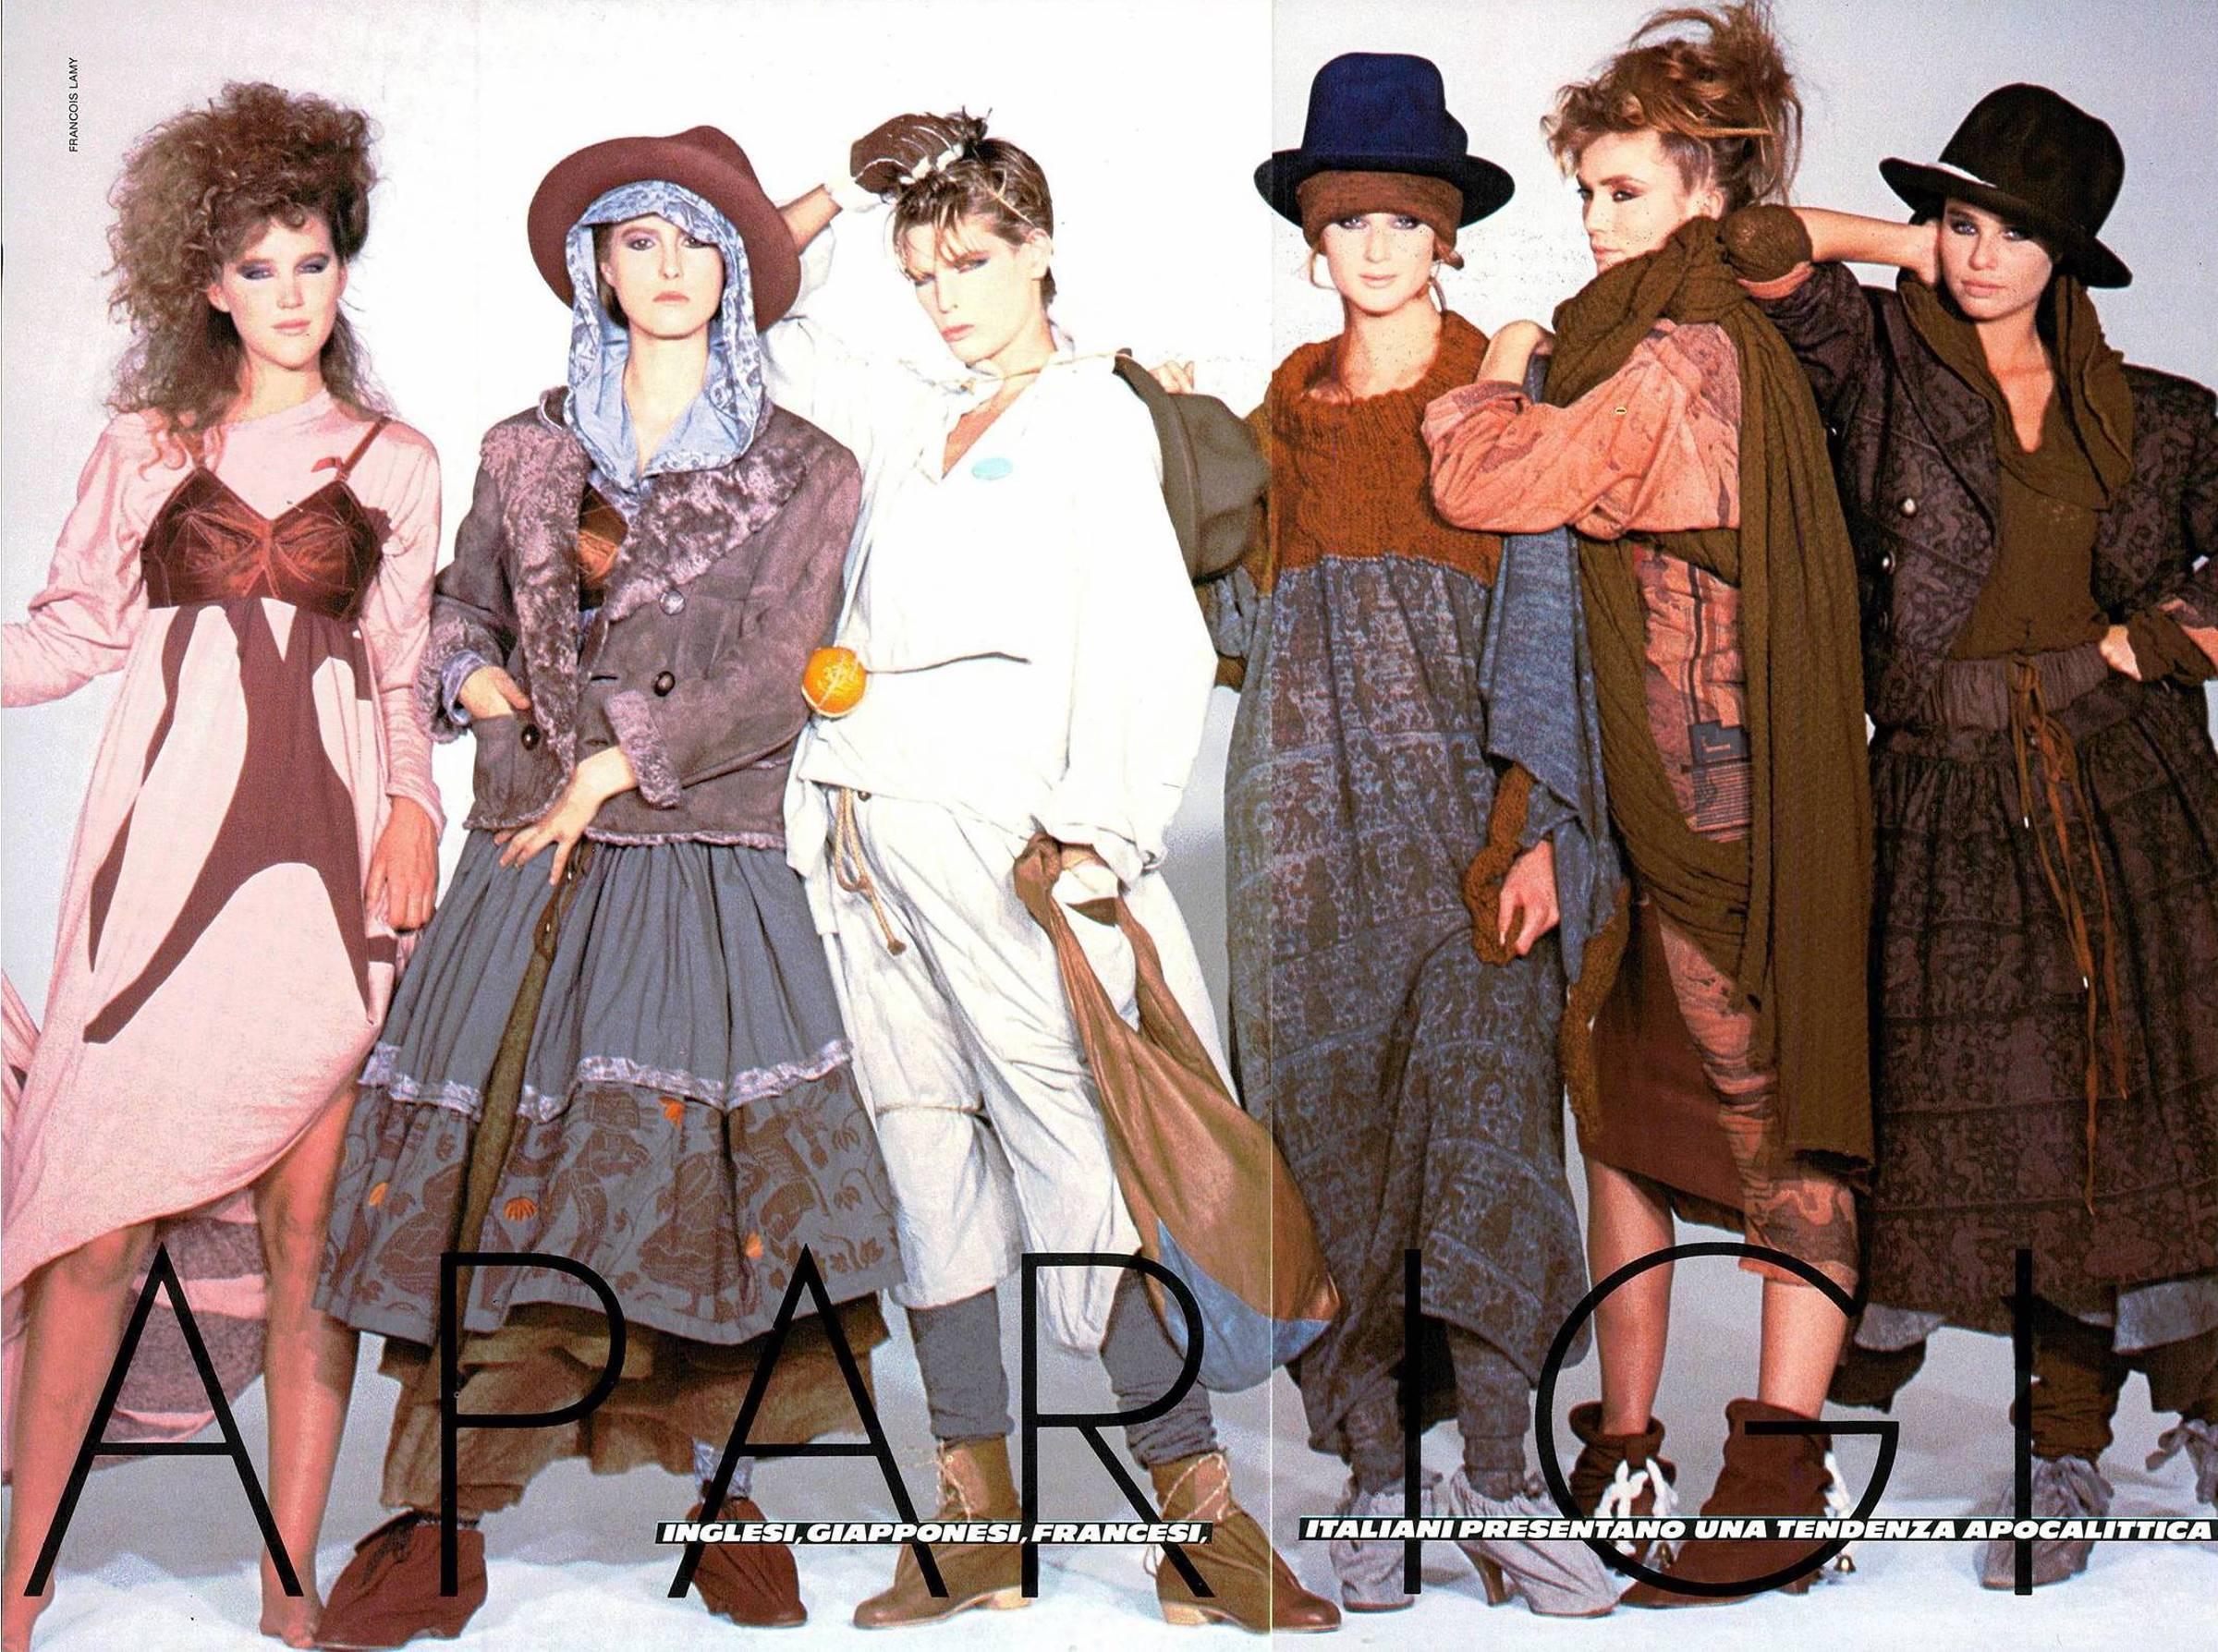 Heroine: Vivienne Westwood's Historical Romp through the 1980s